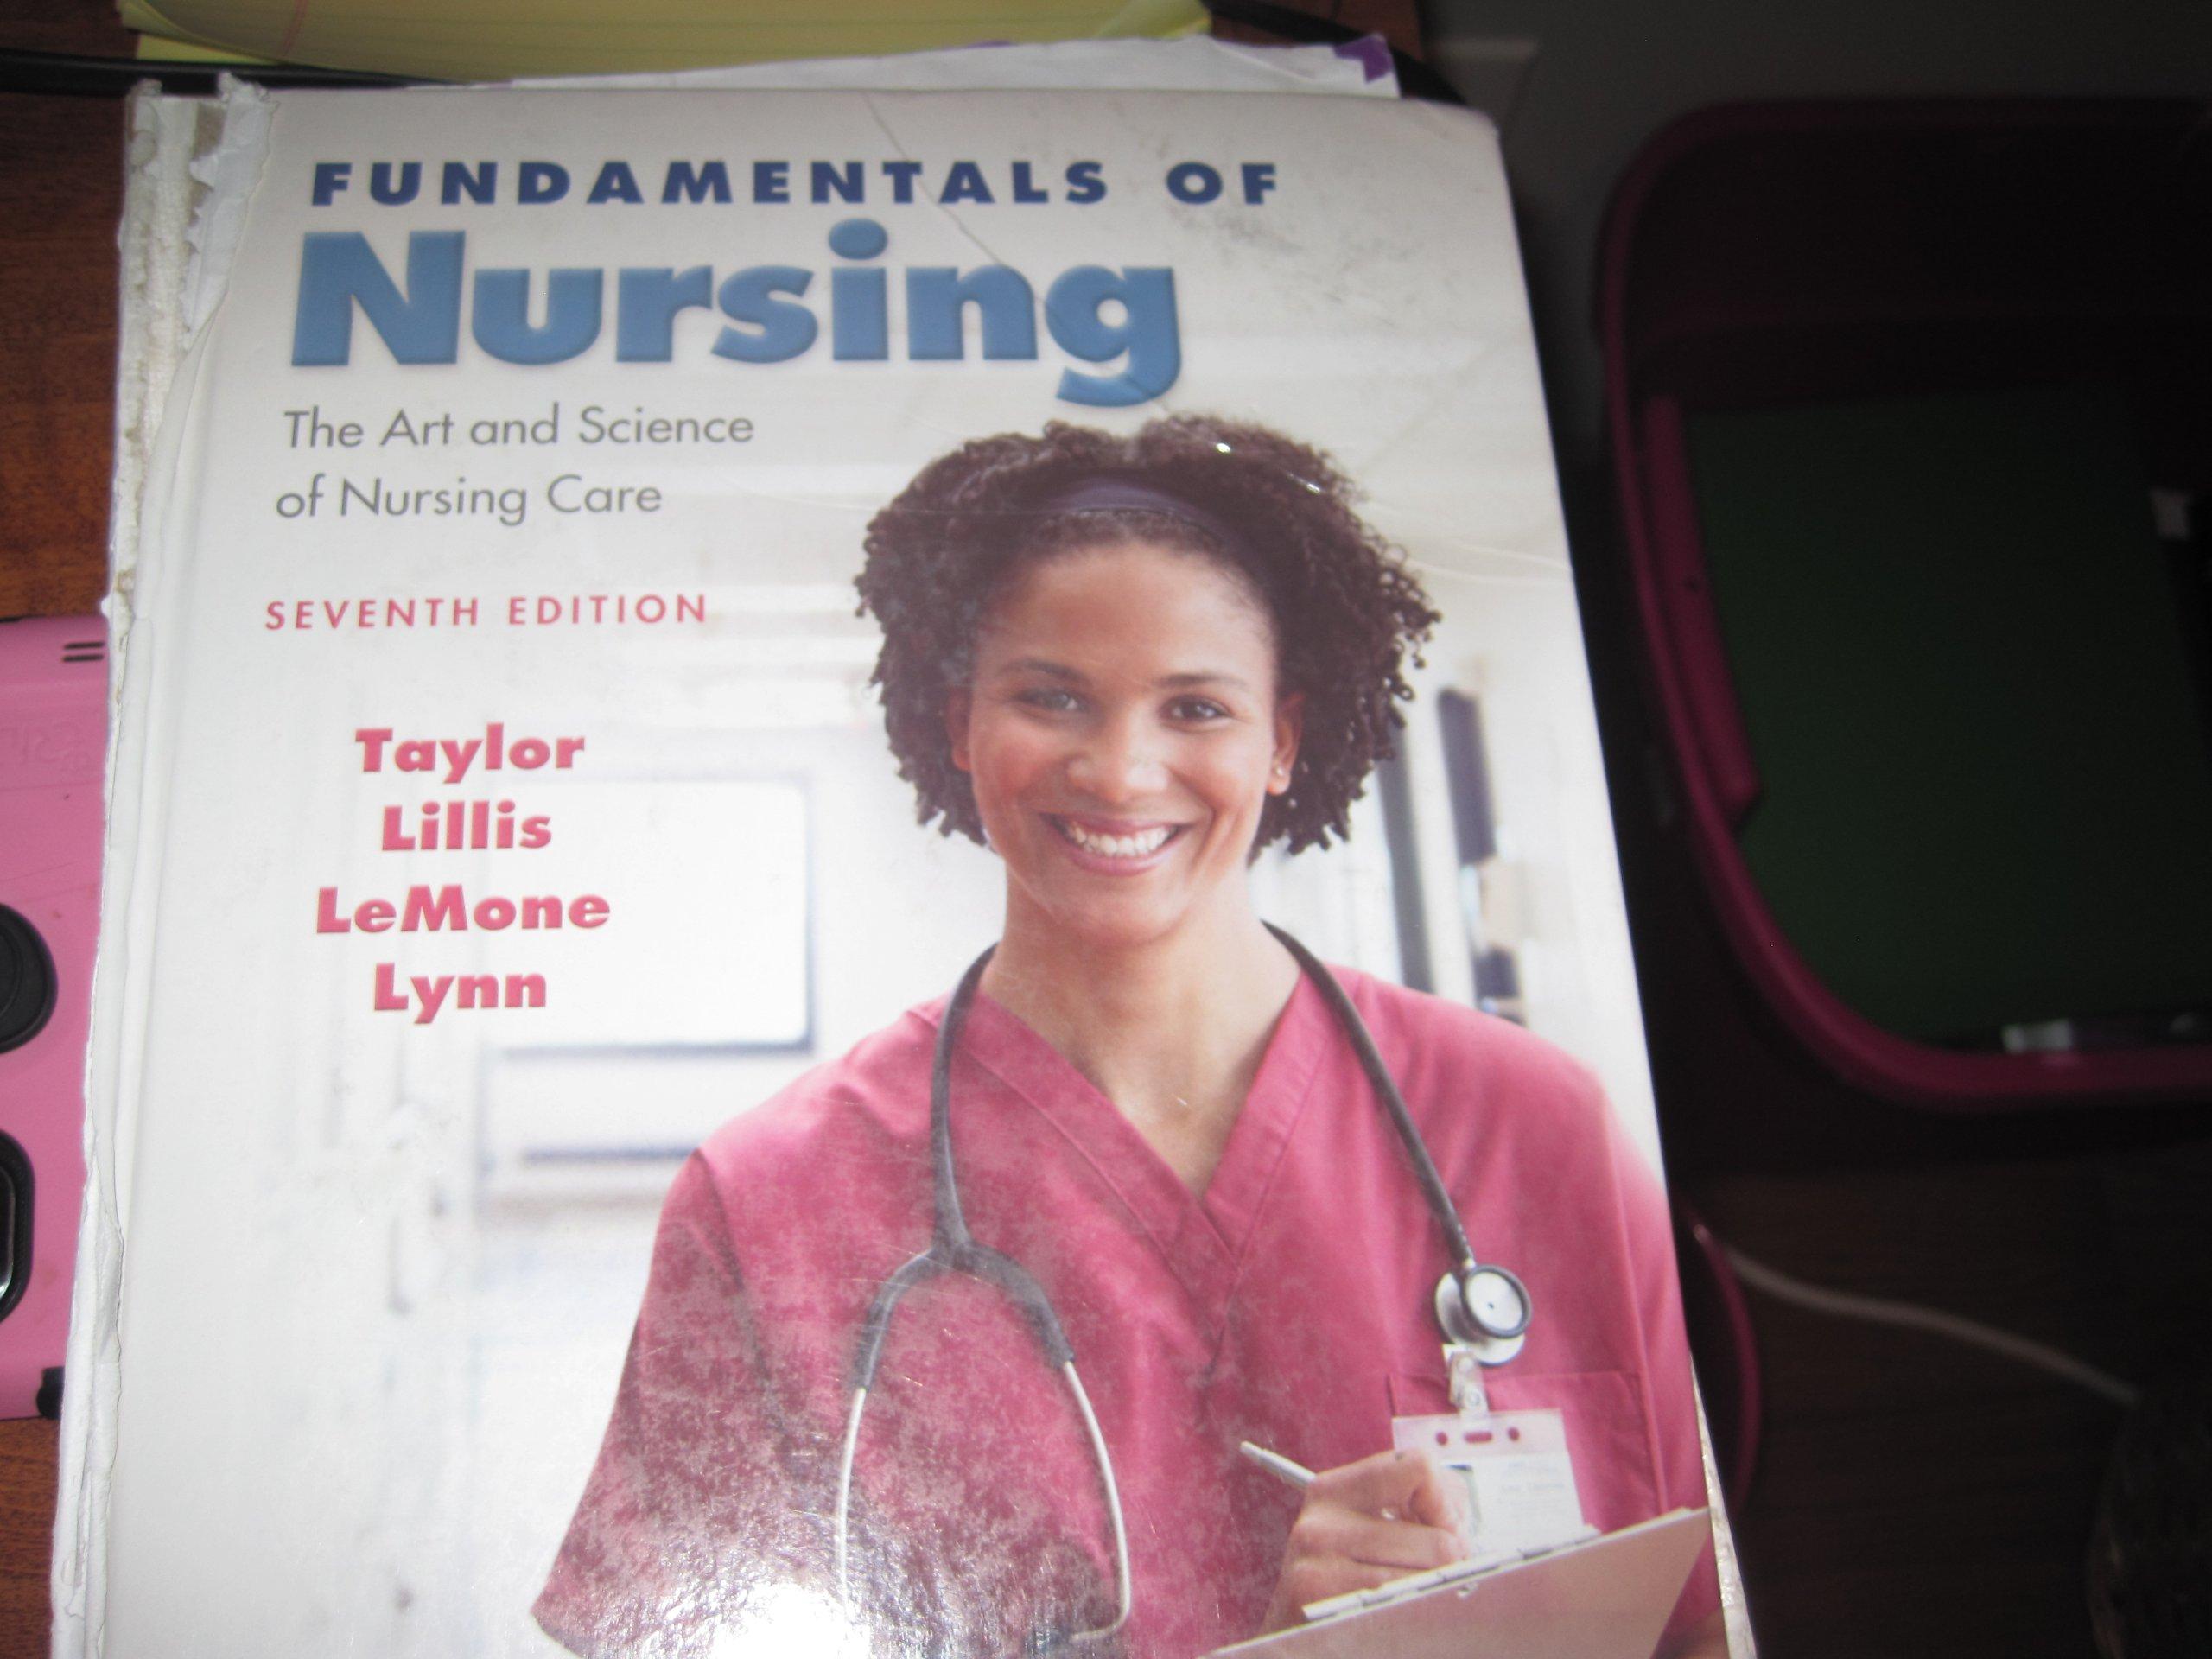 Fundamentals of nursing 7th edition: taylor lillis lemone lynn.